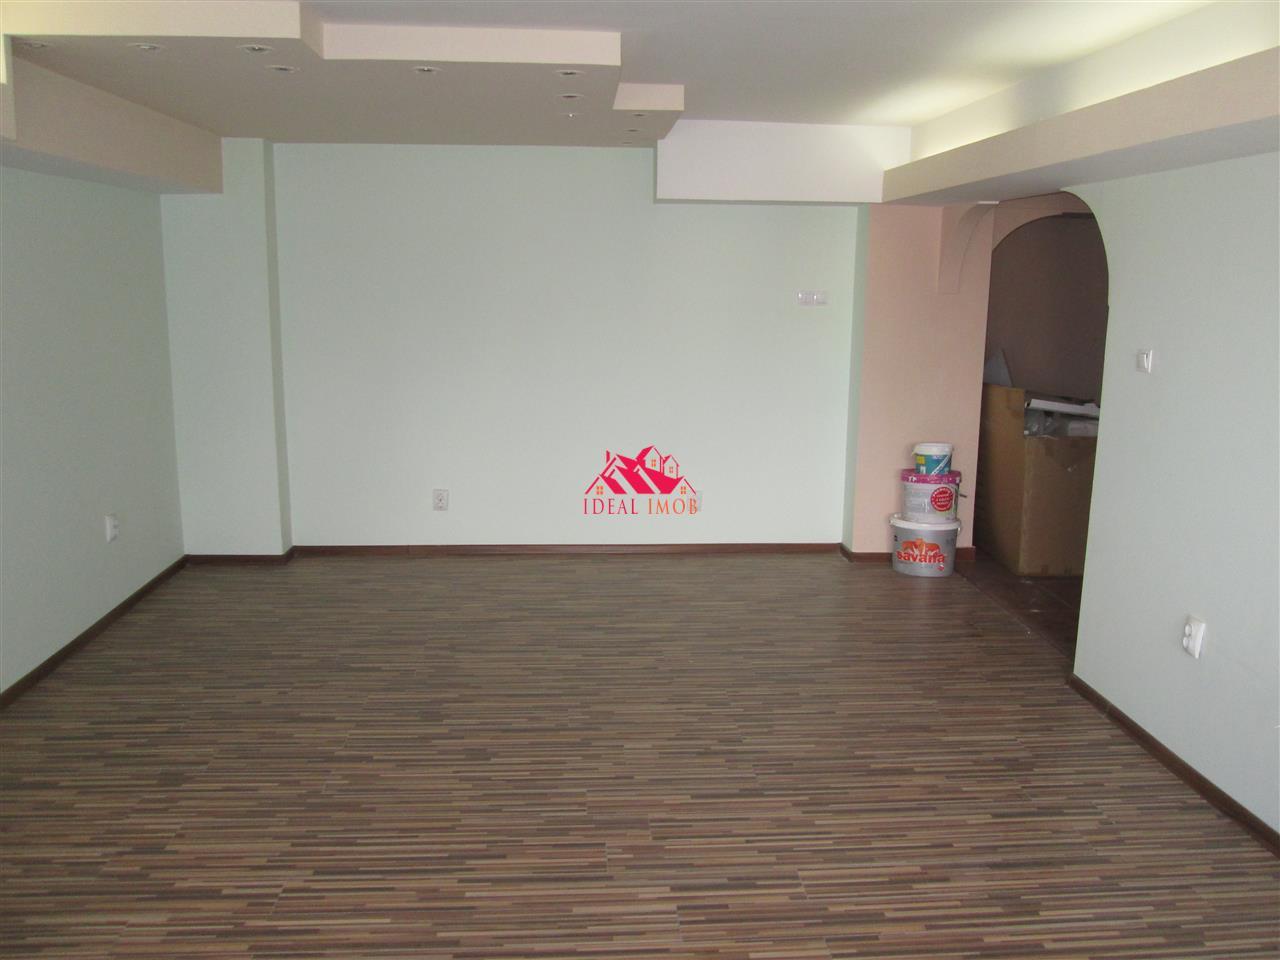 4 Camere Zona Ultracentrala